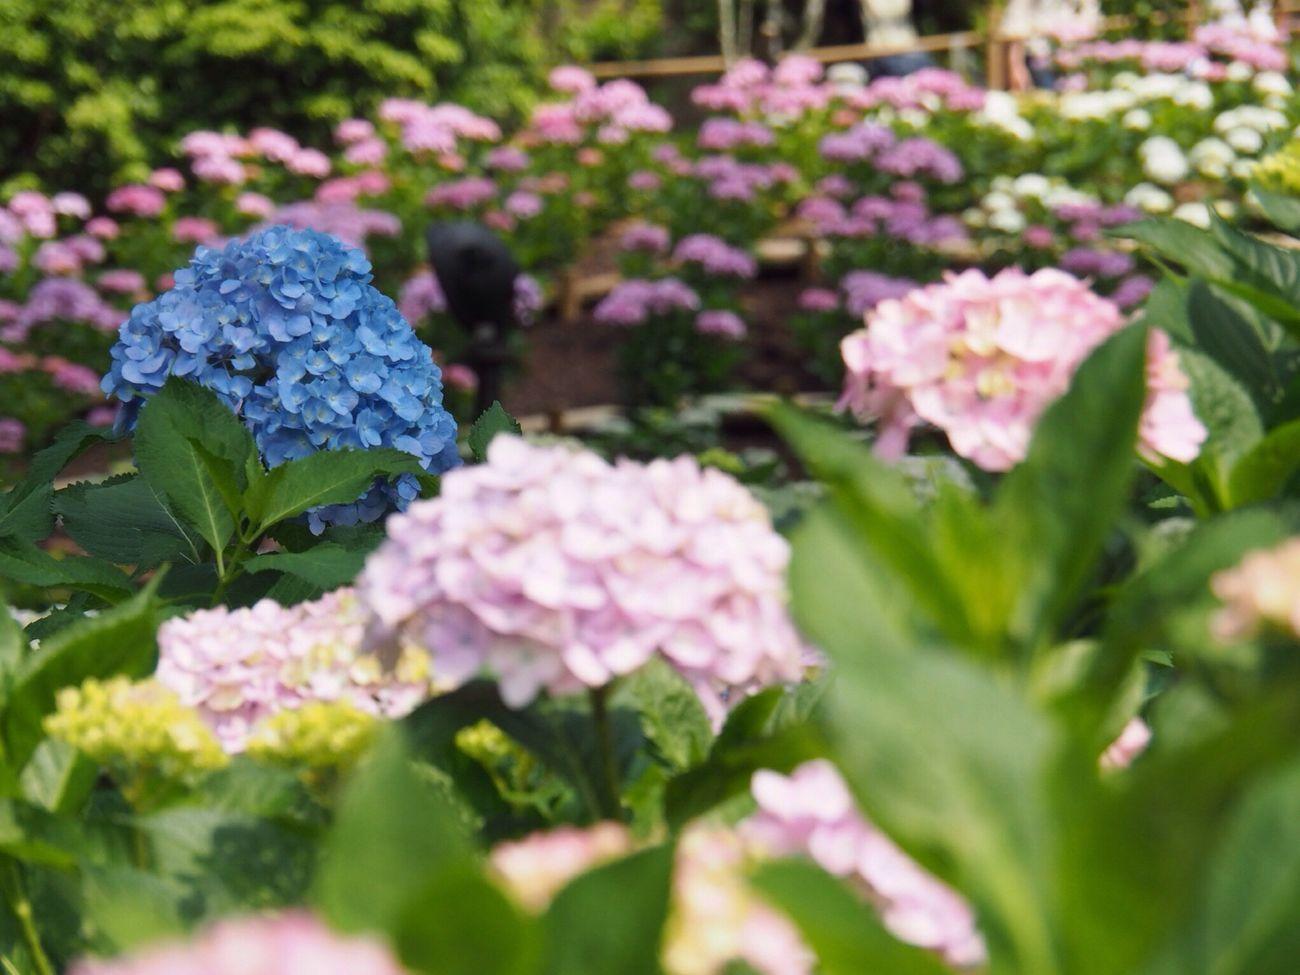 Kyoto Japan Uji Mimurotoji Temple Hydrangea Flower Plant Growth Beauty In Nature Nature Day Outdoors Blue Pink Olympus PEN-F 京都 日本 宇治 三室戸寺 紫陽花 10,000株の紫陽花